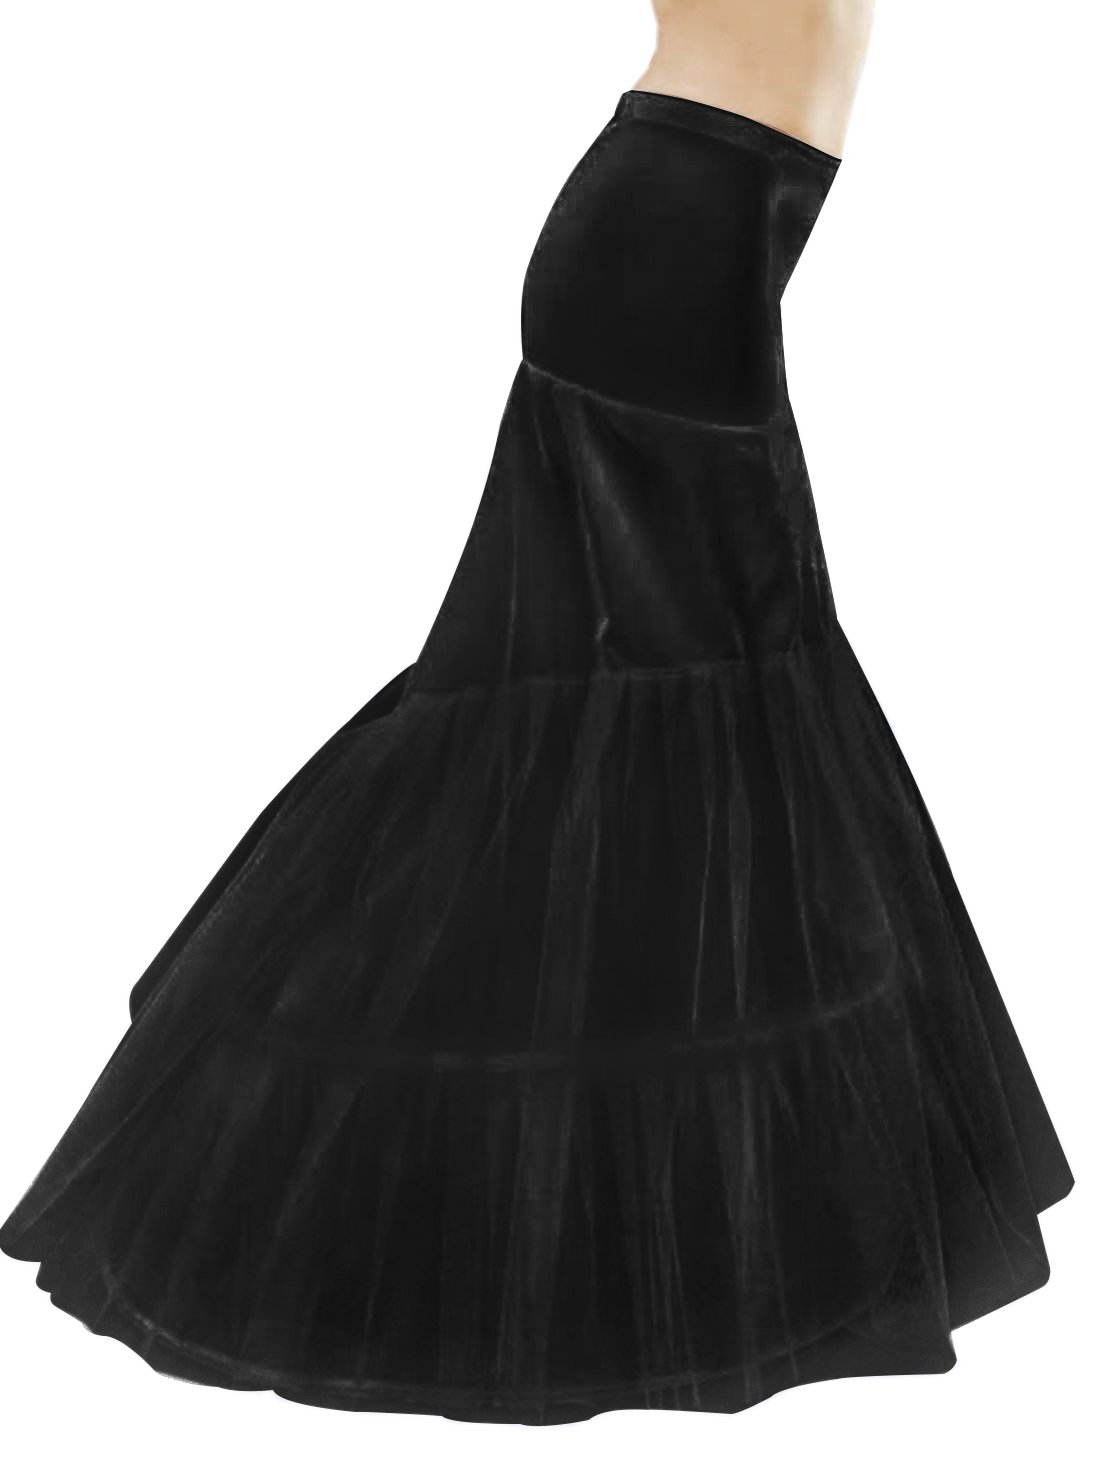 MISSYDRESS Floor-length Dress Gown Slip Mermaid Fishtail Petticoat 3C-56VO-ZWLO